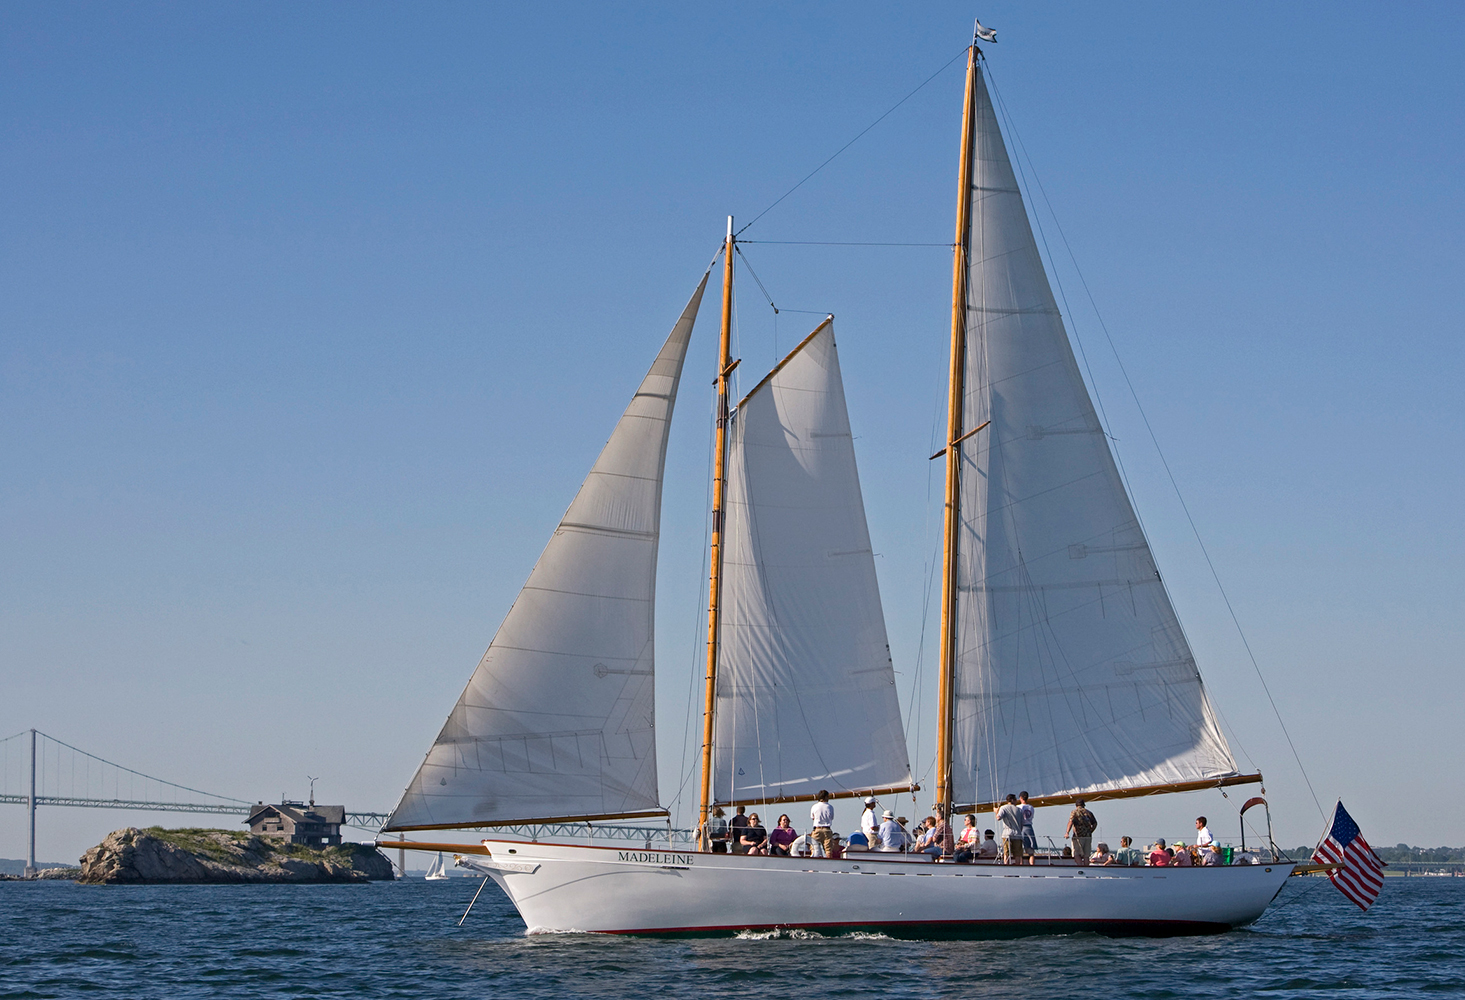 Sailing_Newport-Harbor_La-Farge-Perry-House_Explore Newport.jpg